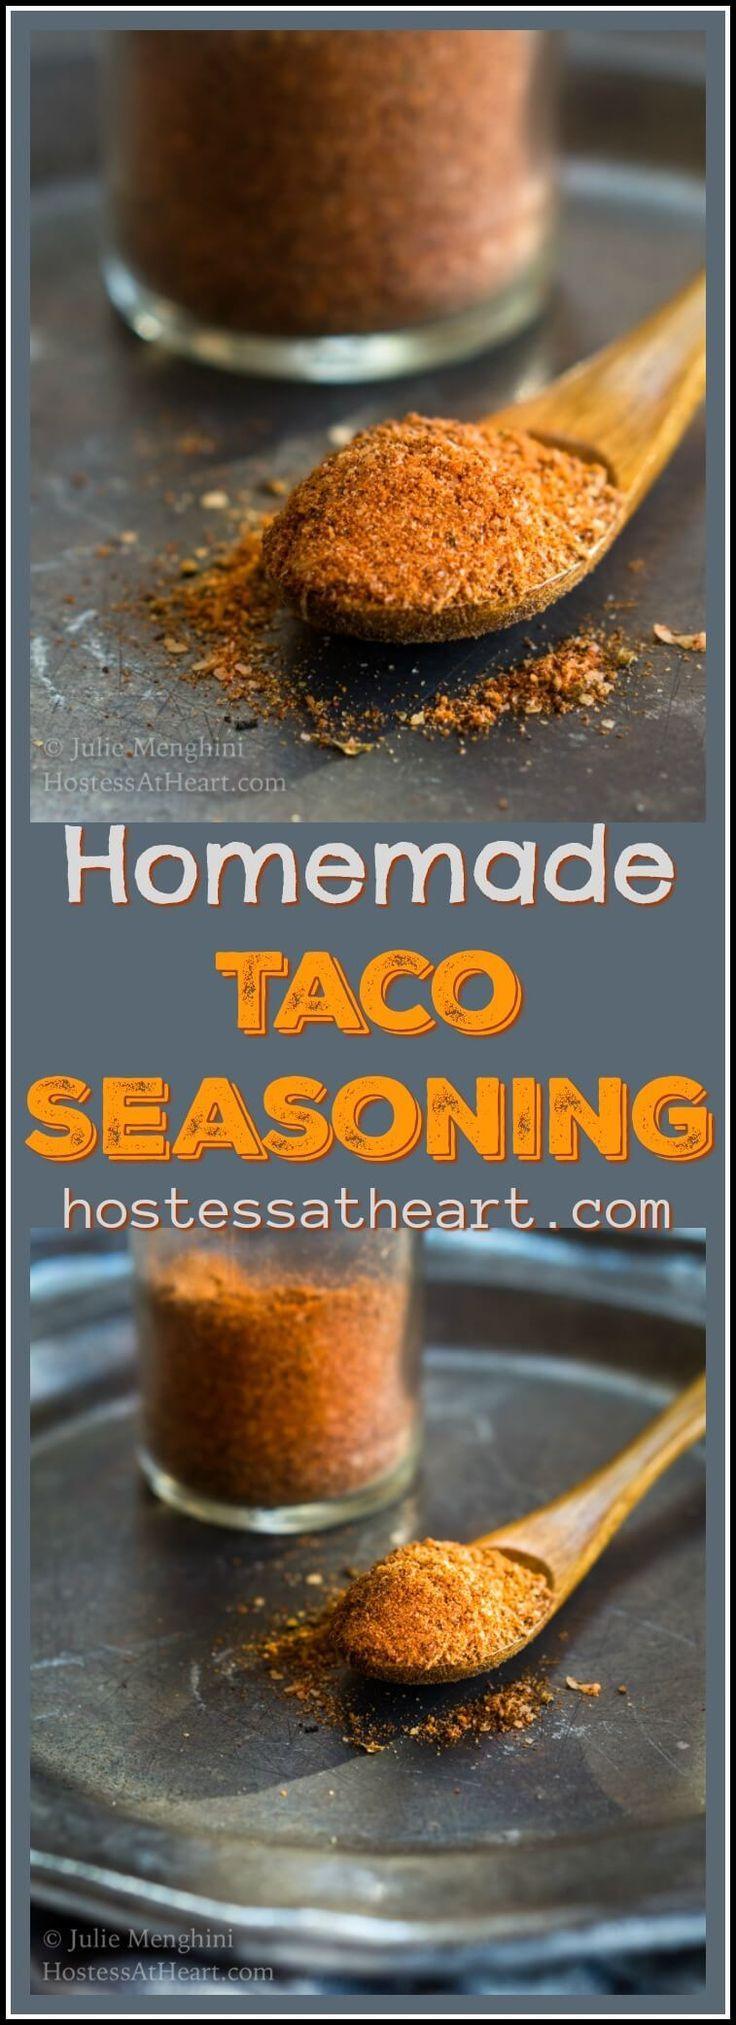 Homemade Taco Seasoning allows you to season dishes